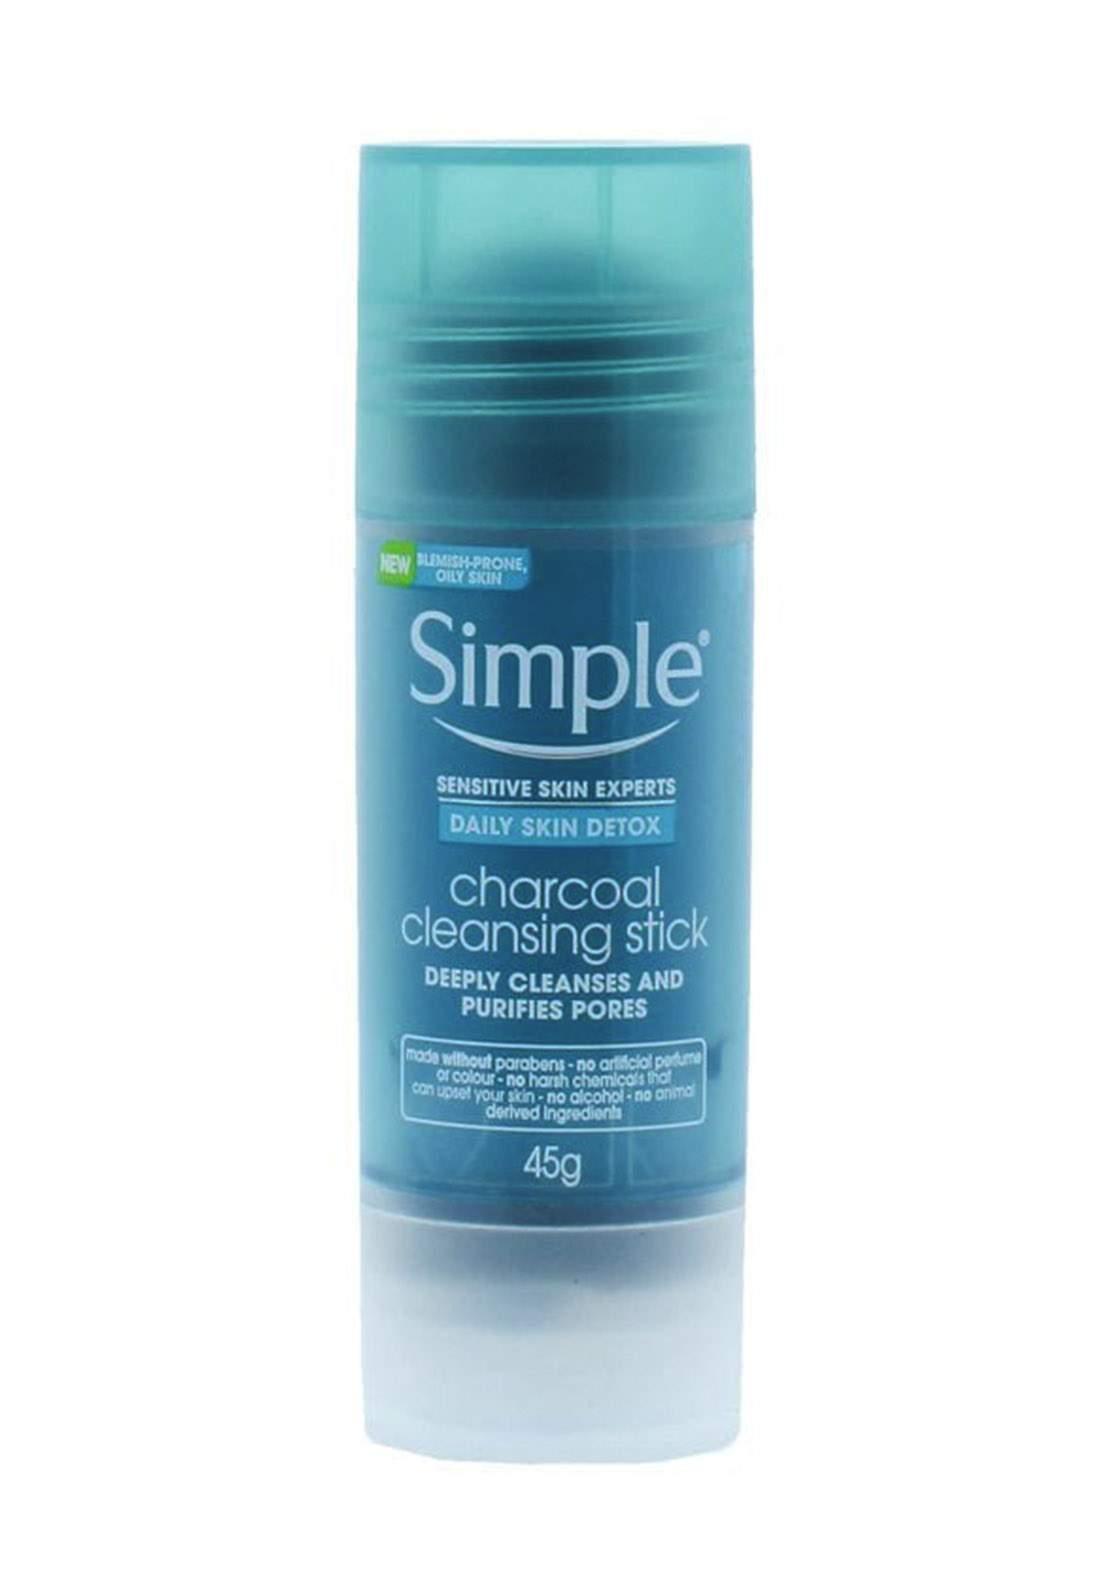 Simple (00361xda) Daily Skin Detox Charcoal Cleansing Stick 45g منظف للبشرة